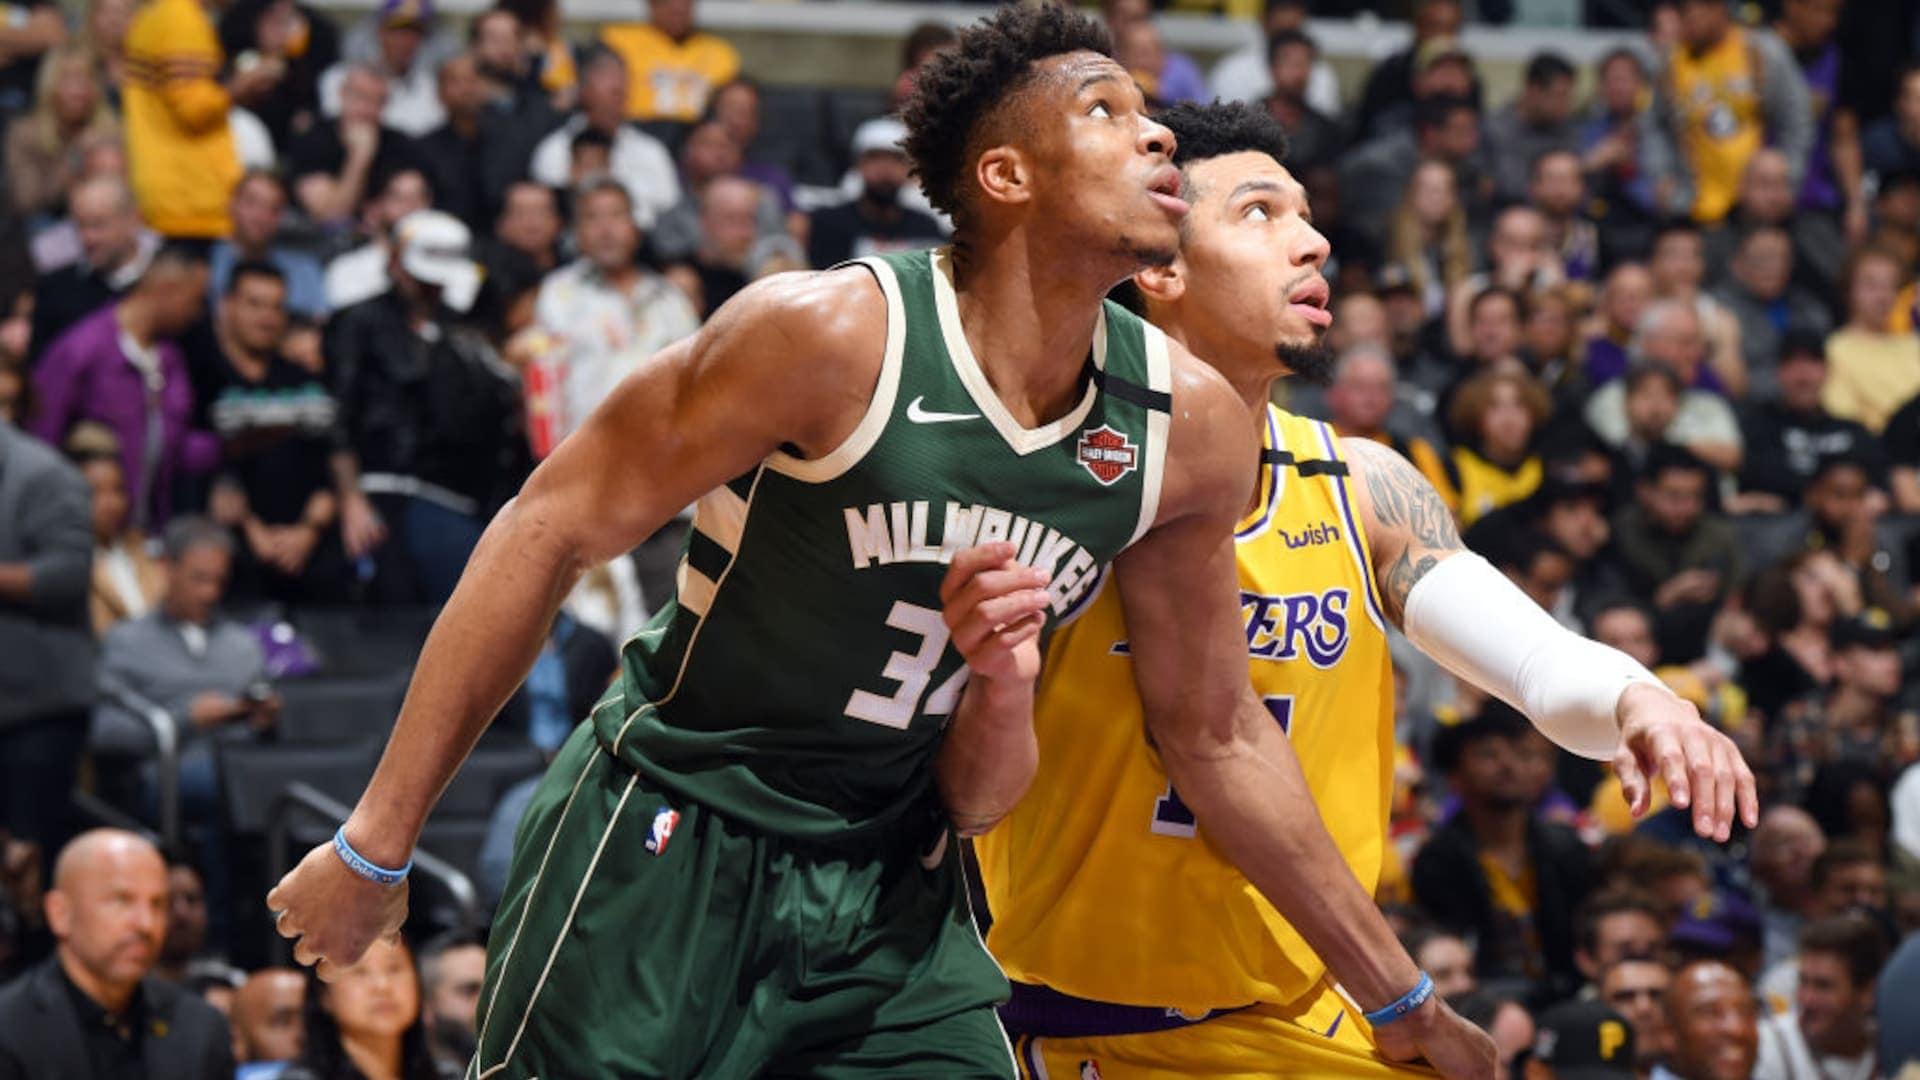 Bucks' Giannis Antetokounmpo has knee sprain, will miss at least 2 games